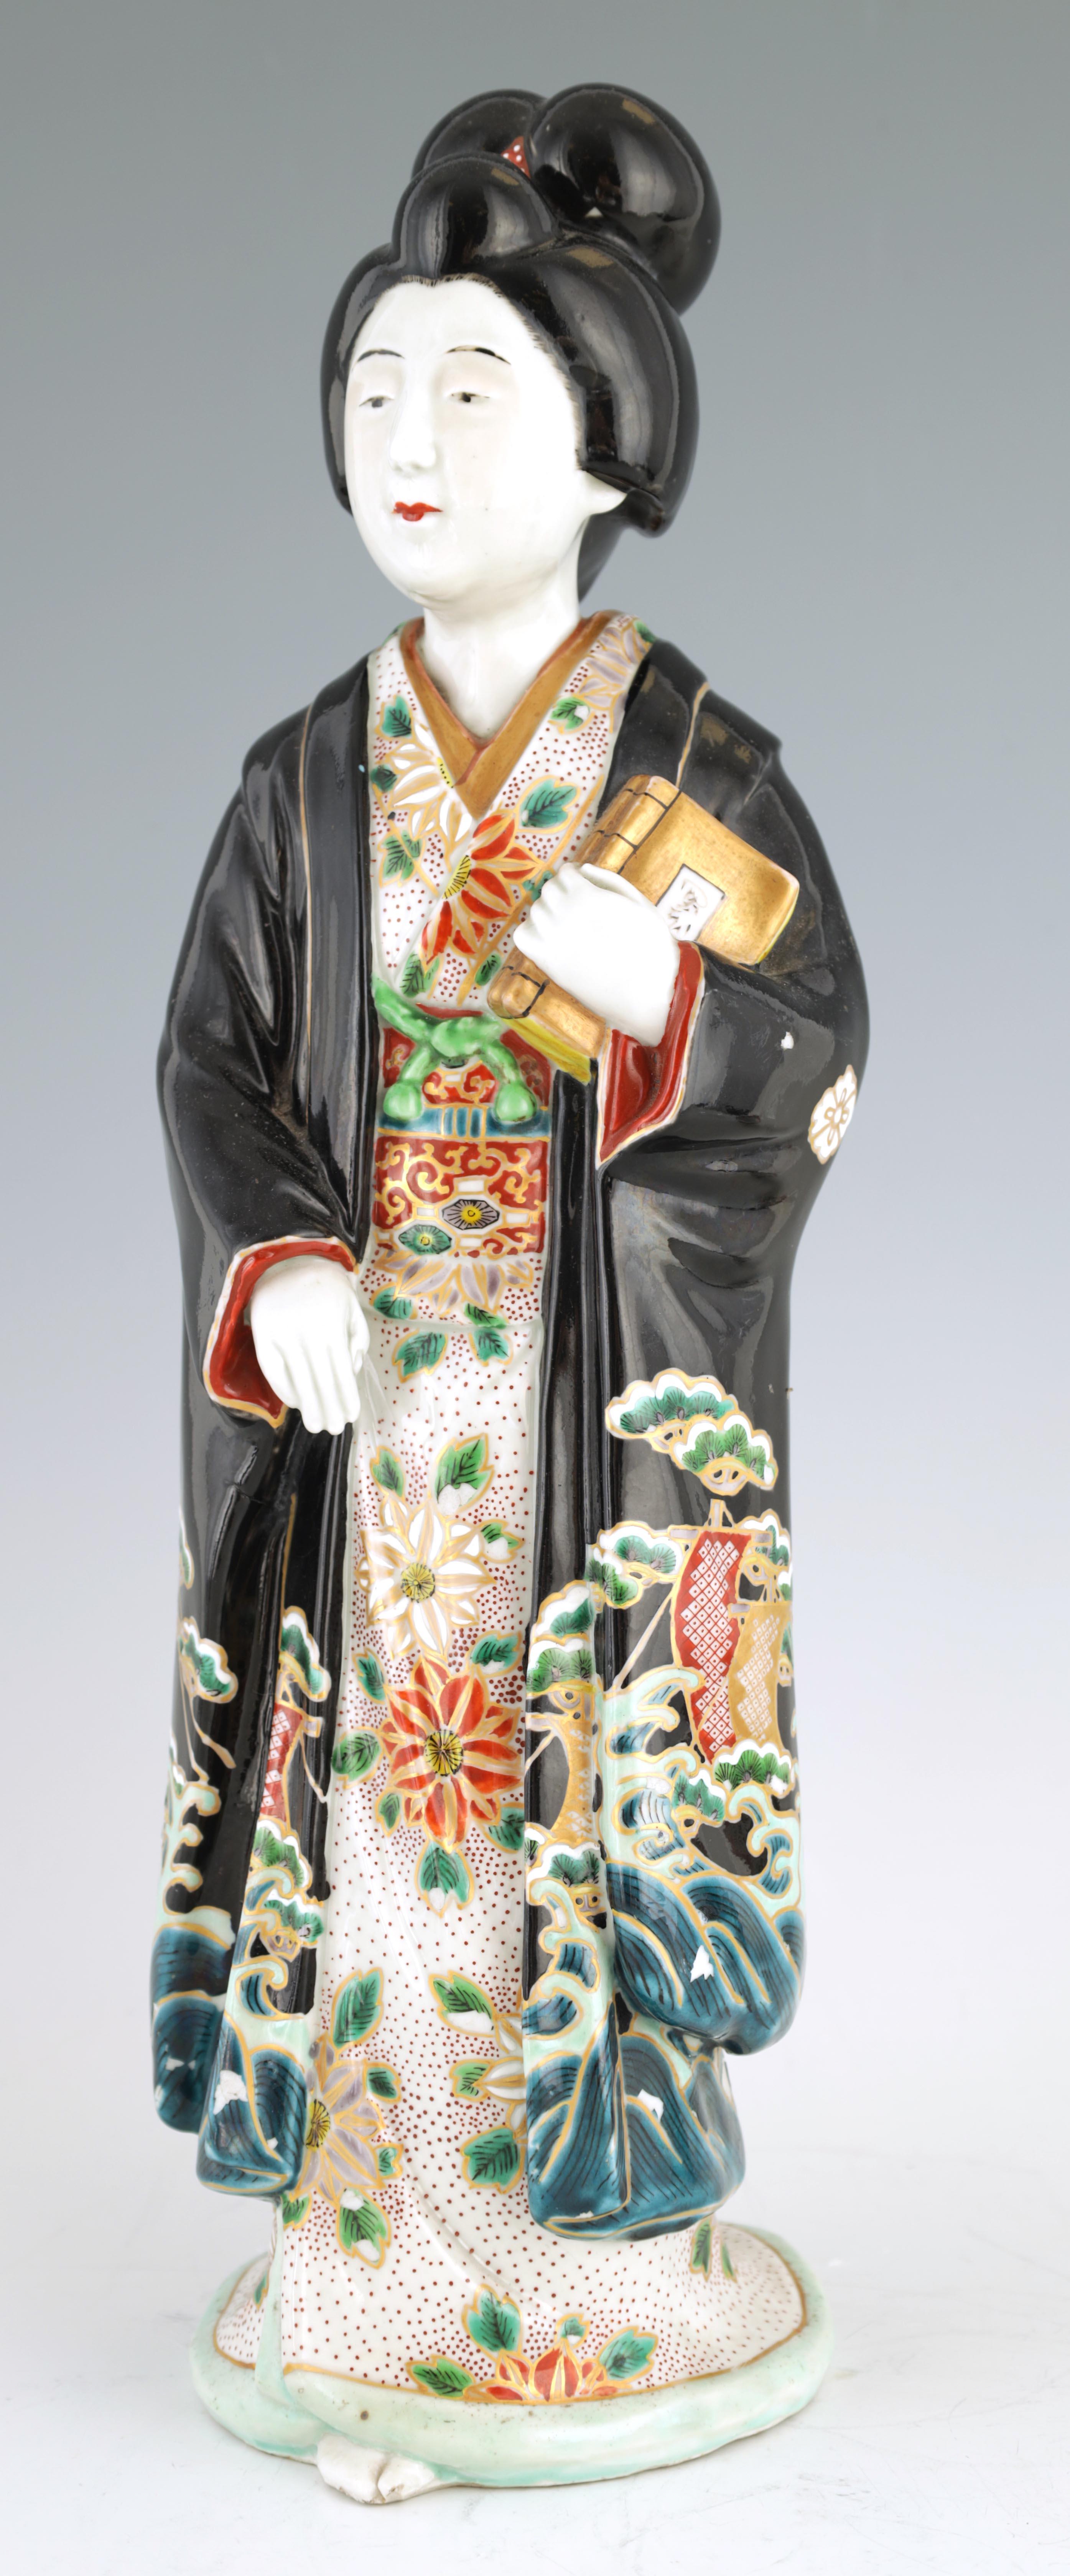 A LARGE MEIJI PERIOD JAPANESE KUTANI FIGURE OF A GEISHA 45cm high